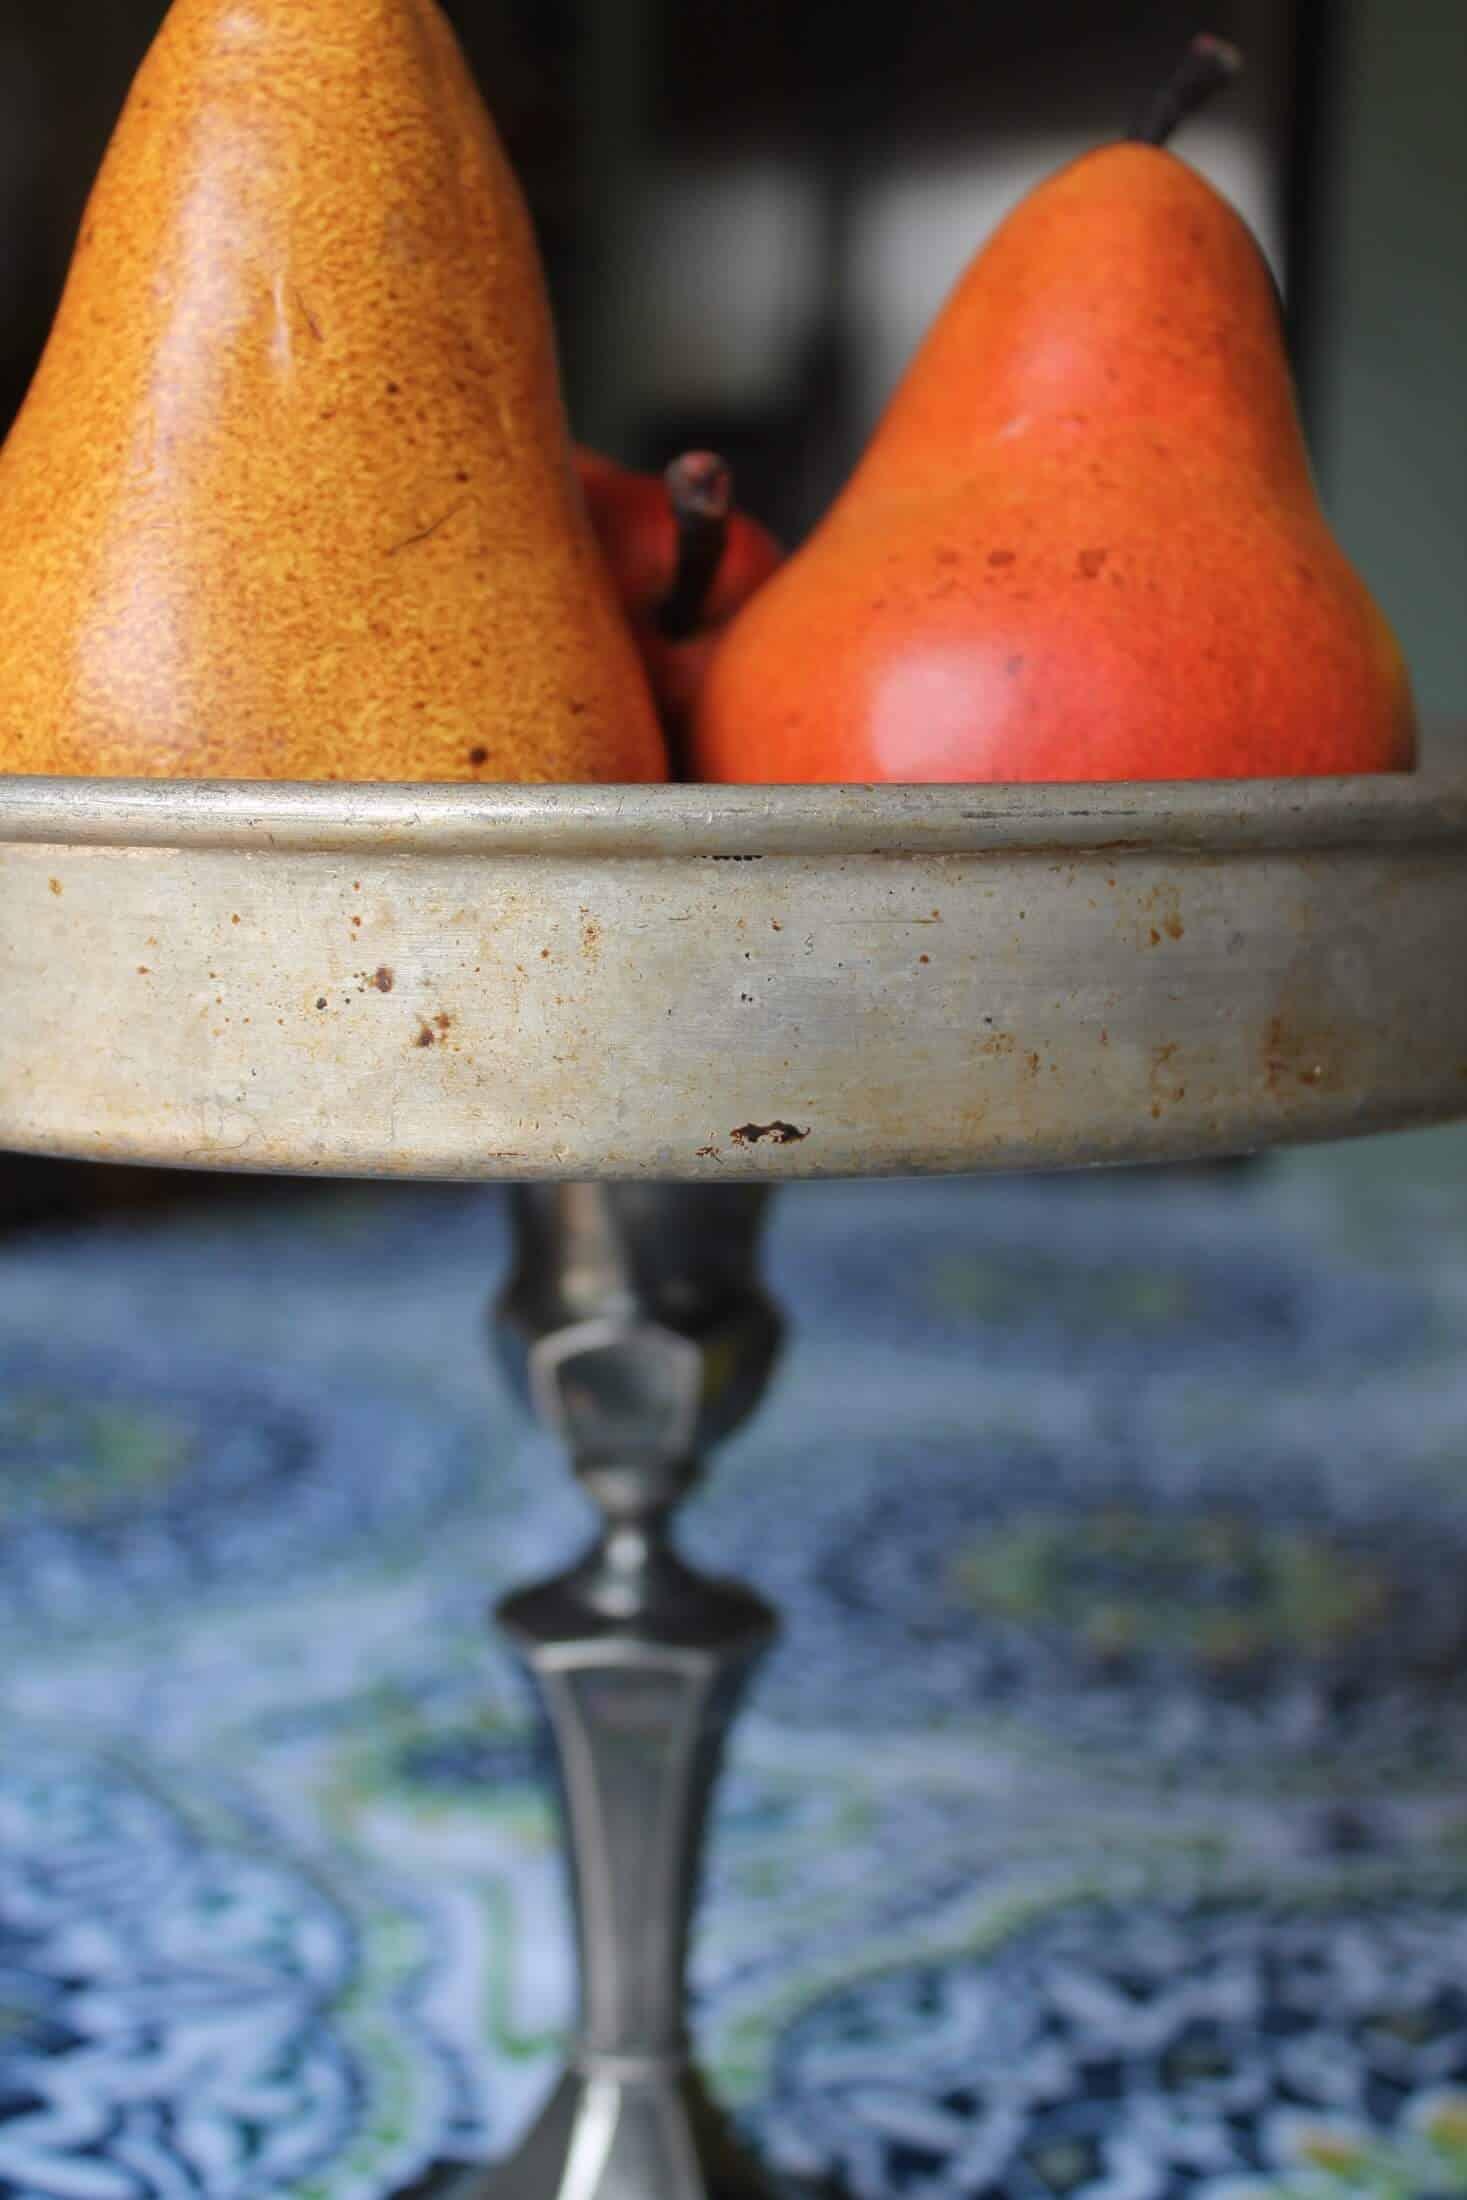 pears in diy pedestal stand